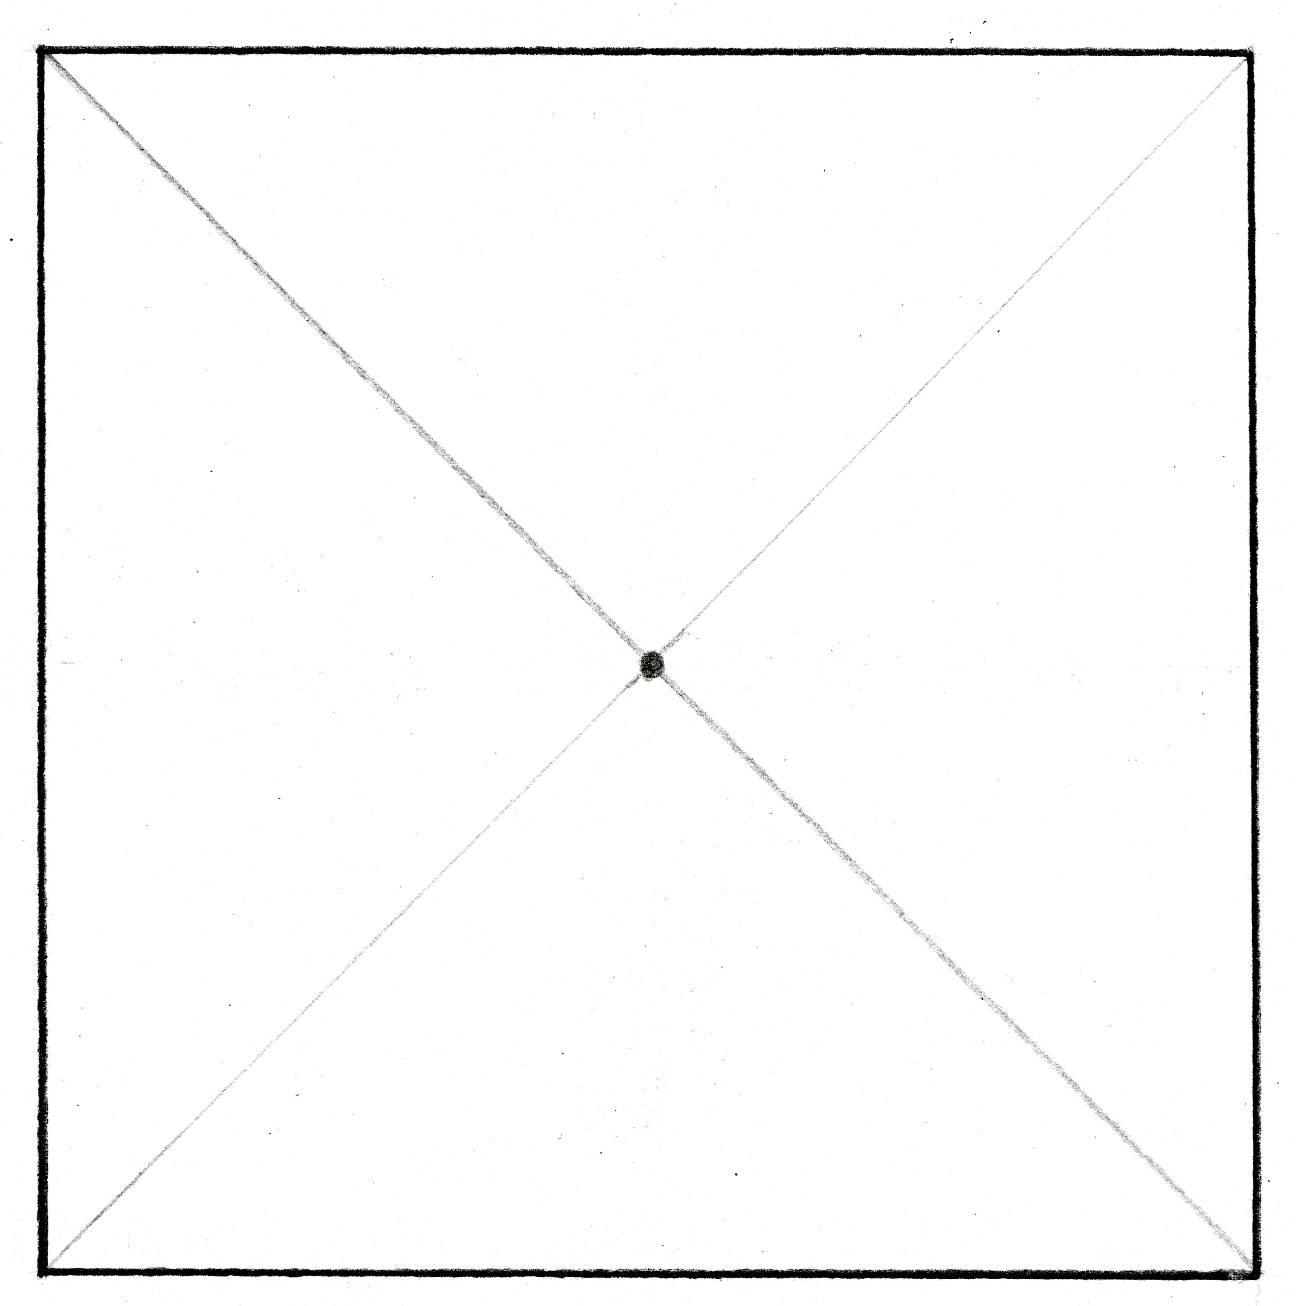 http://lib.convdocs.org/pars_docs/refs/89/88668/88668_html_7cc8f8a.jpg